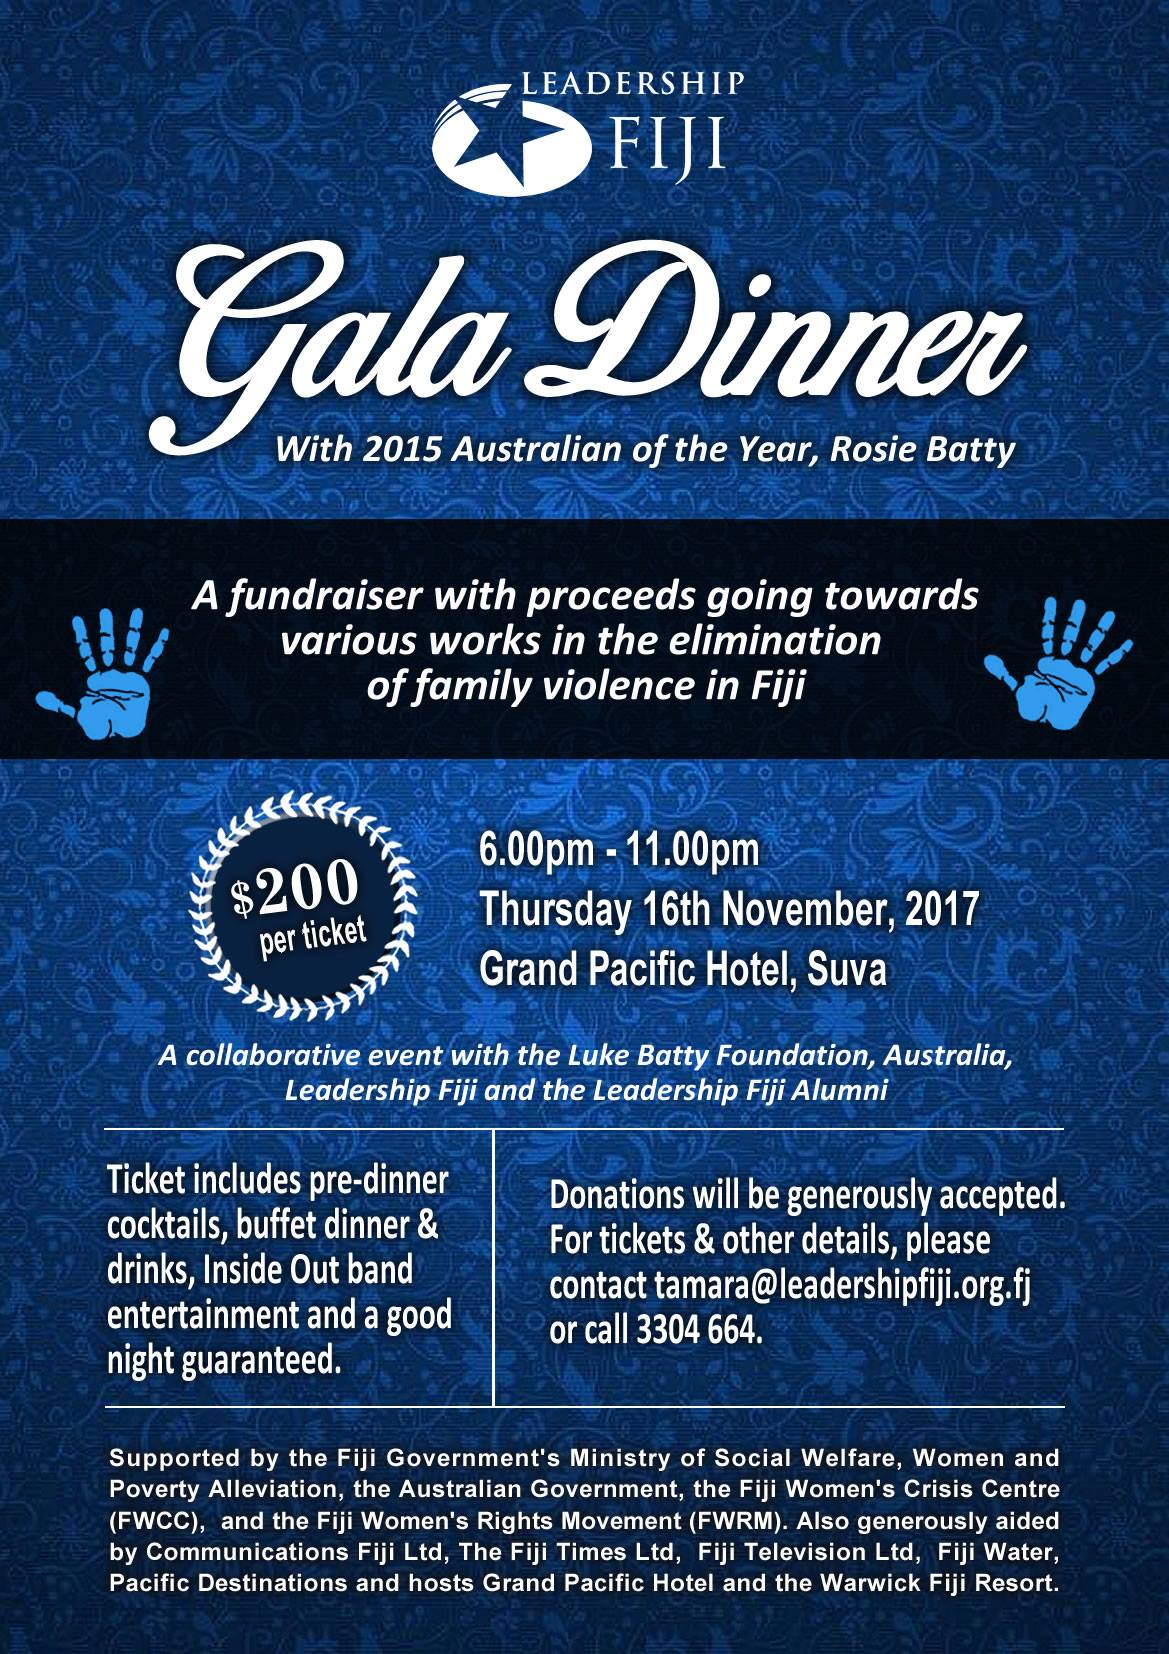 Leadership Fiji Gala Dinner 2017 Flyer